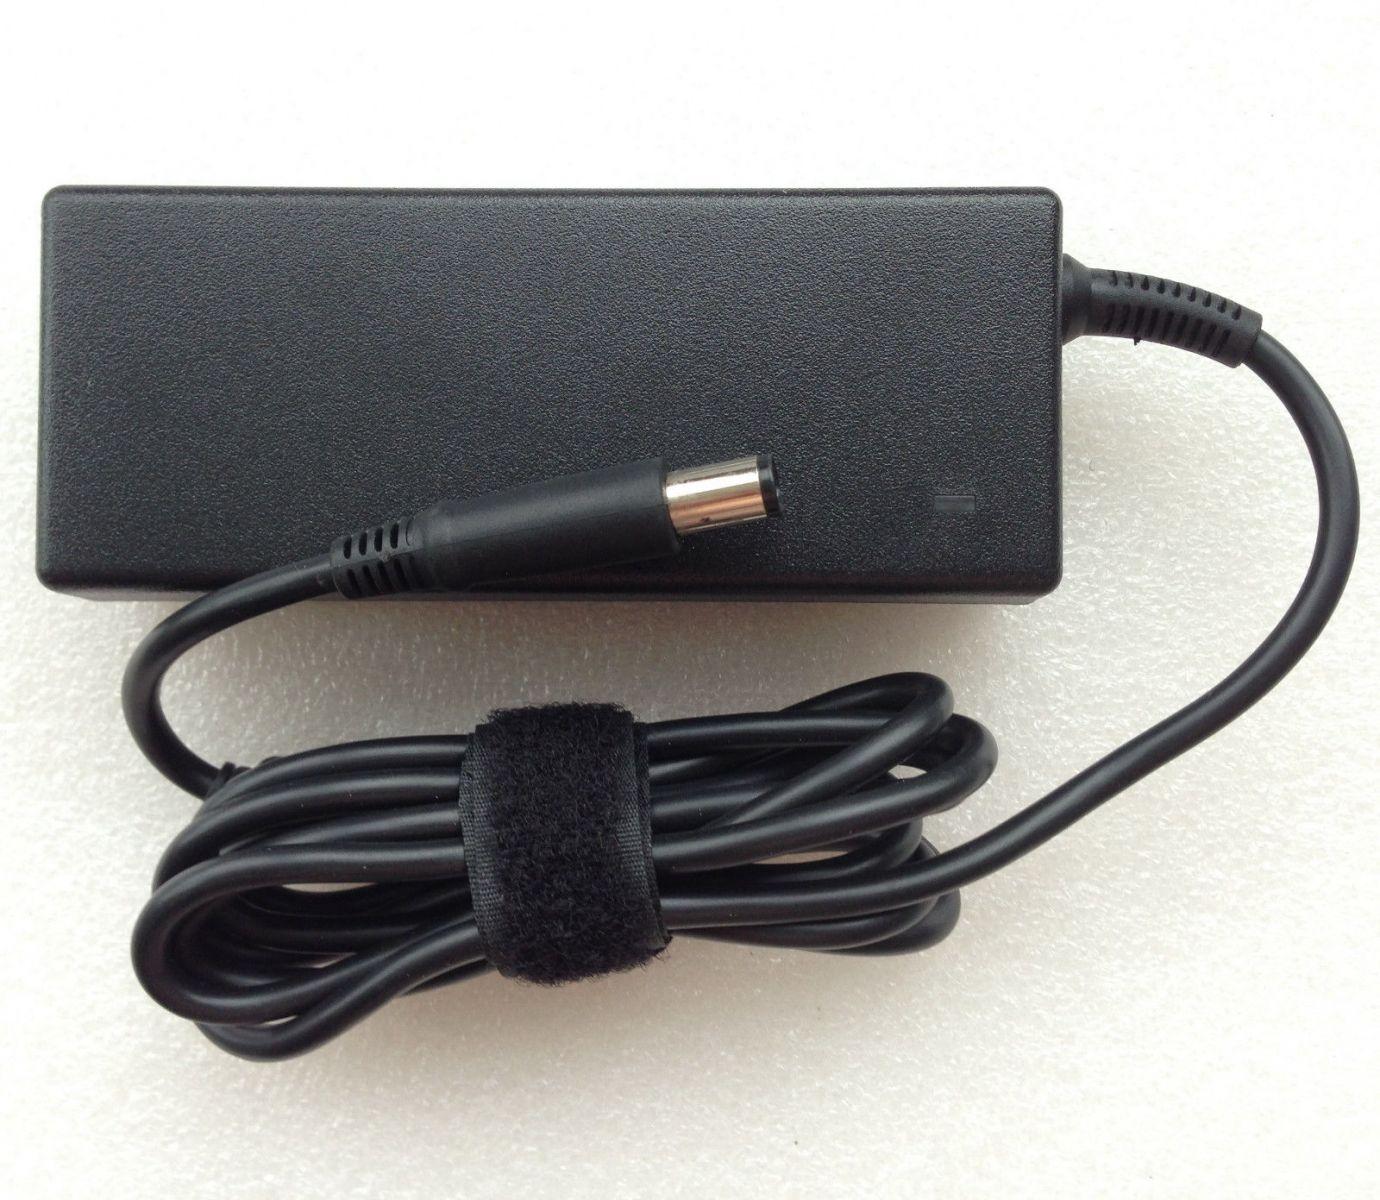 Sạc cho laptop Dell Inspiron 5537 Adapter 19.5V-3.34A, 19.5V-4.62A